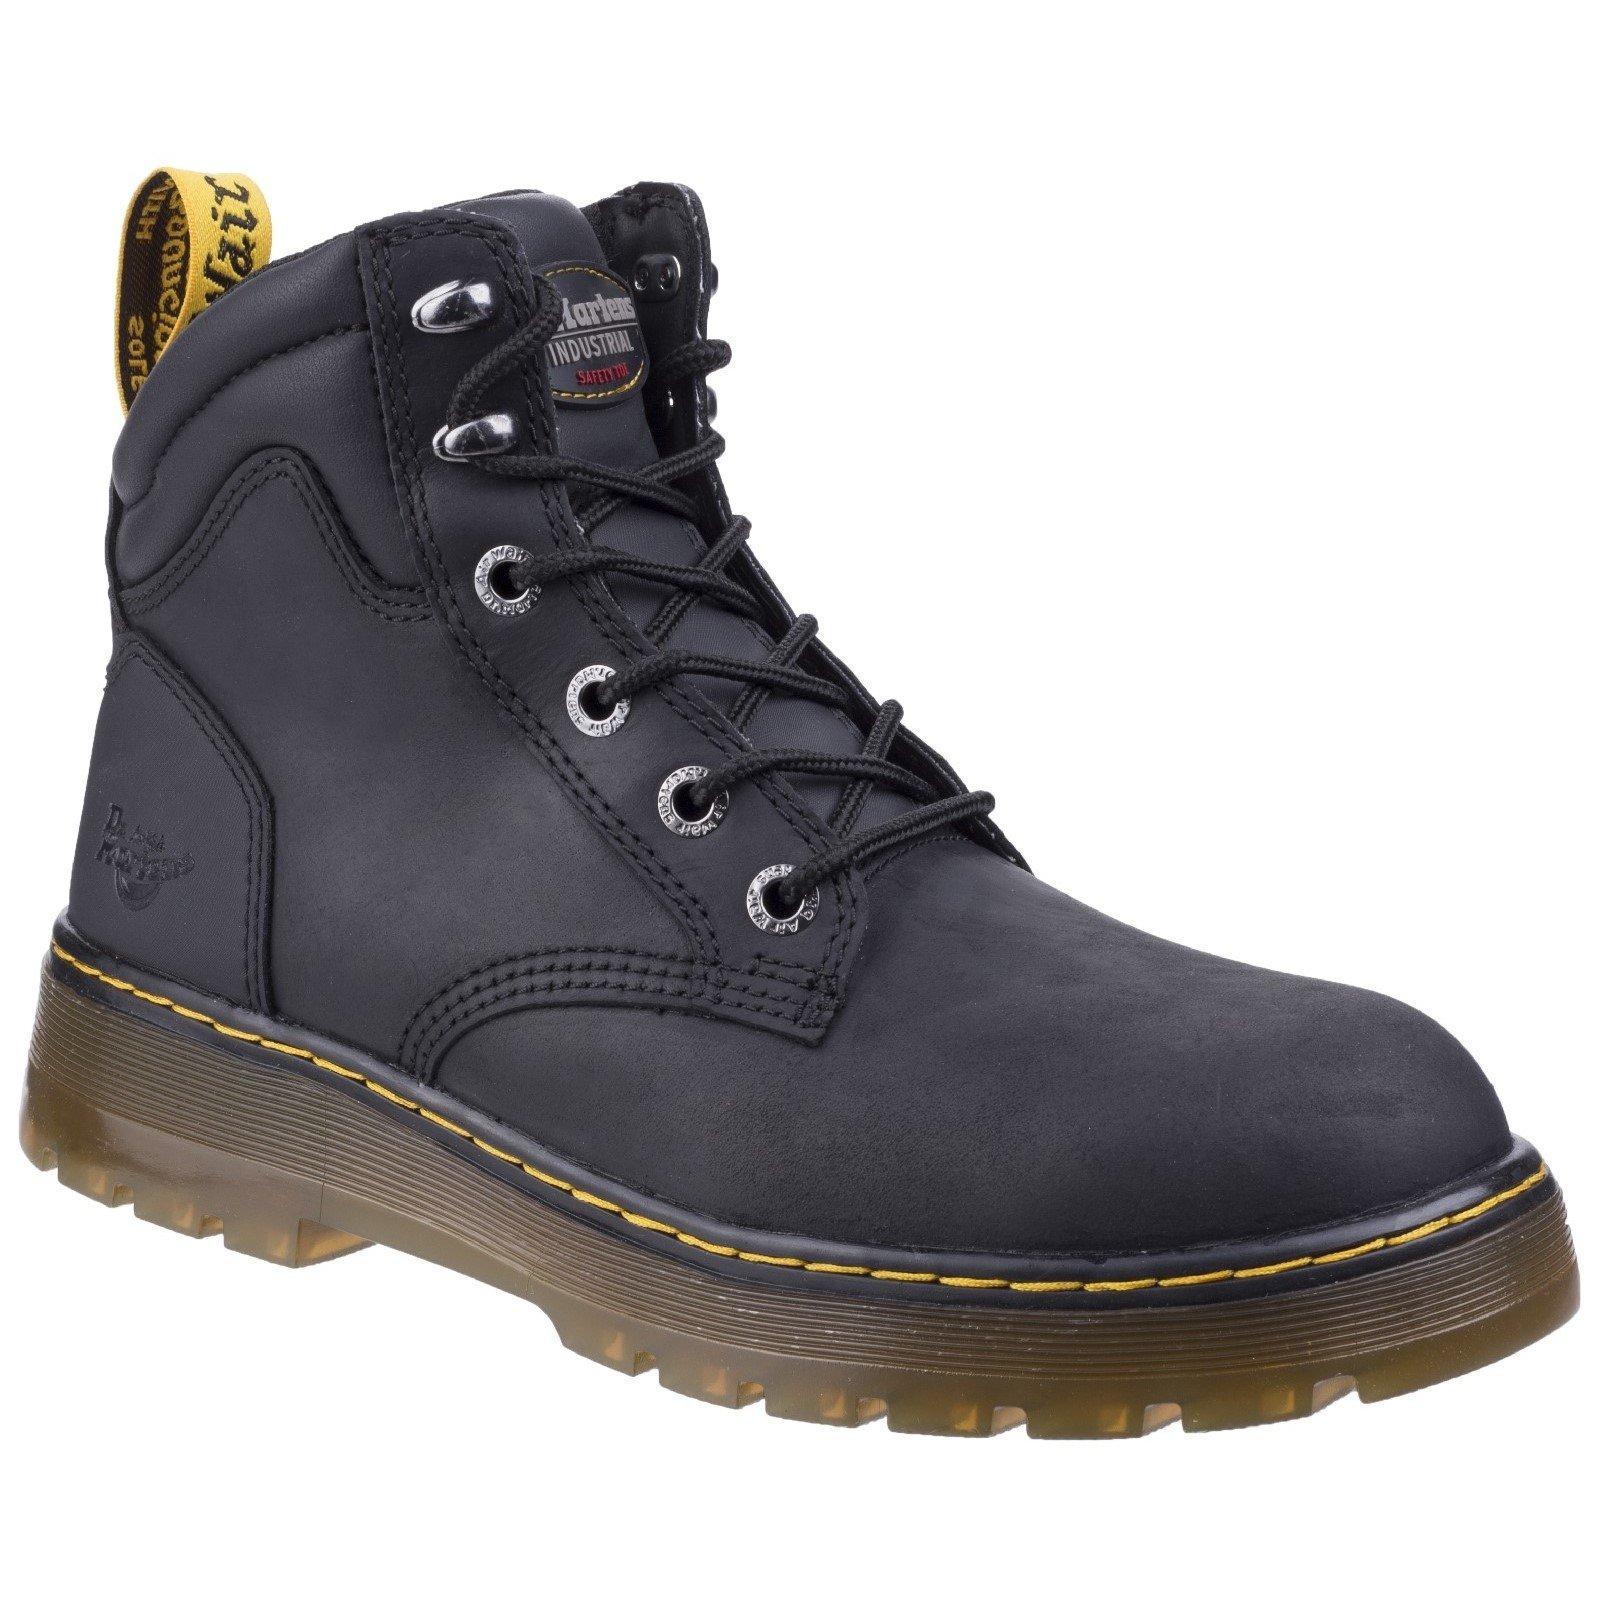 Dr Martens Unisex Brace Hiking Style Safety Boot Various Colours 27702-46606 - Black Republic 6